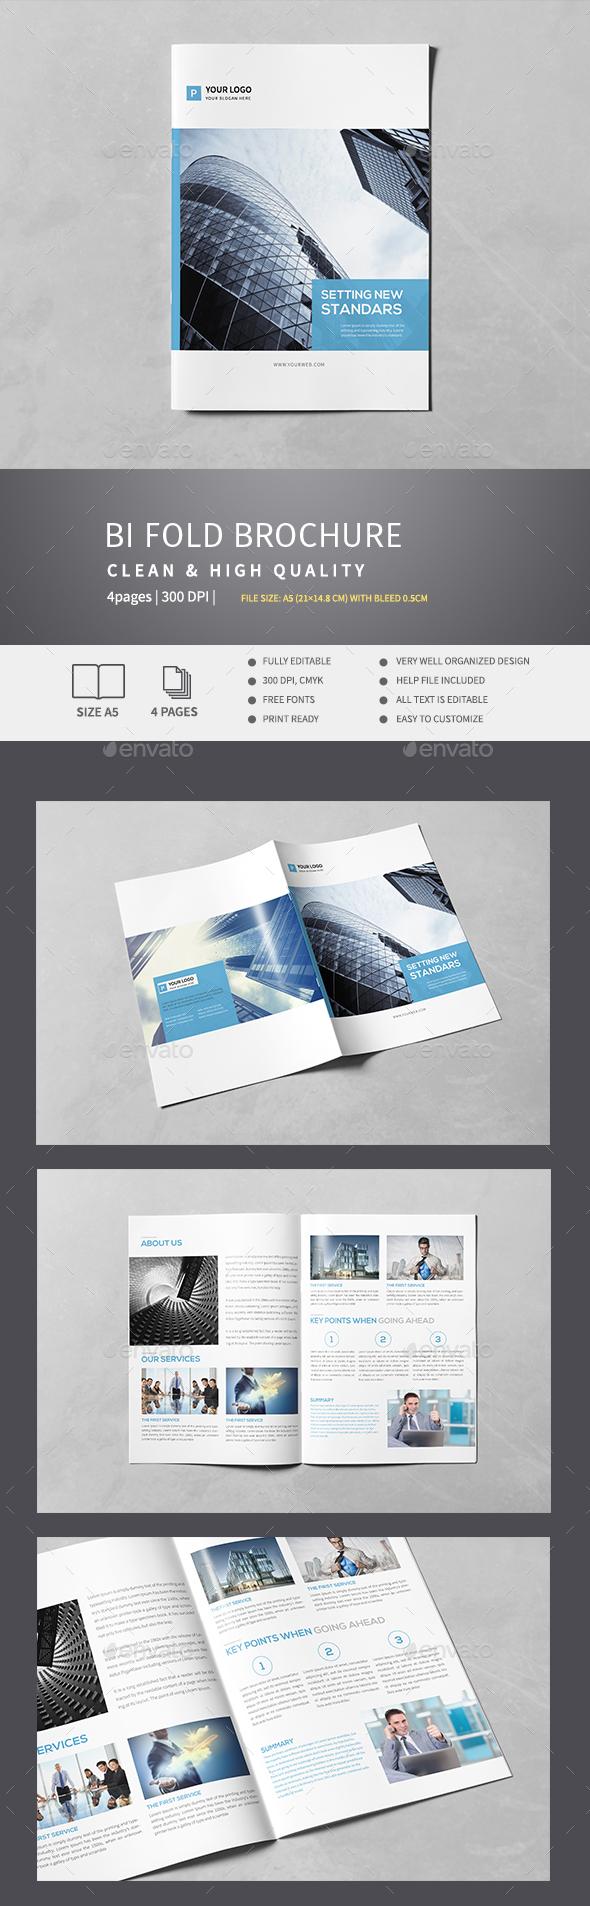 Corporate Bi-Fold Brochure v.3 - Corporate Brochures